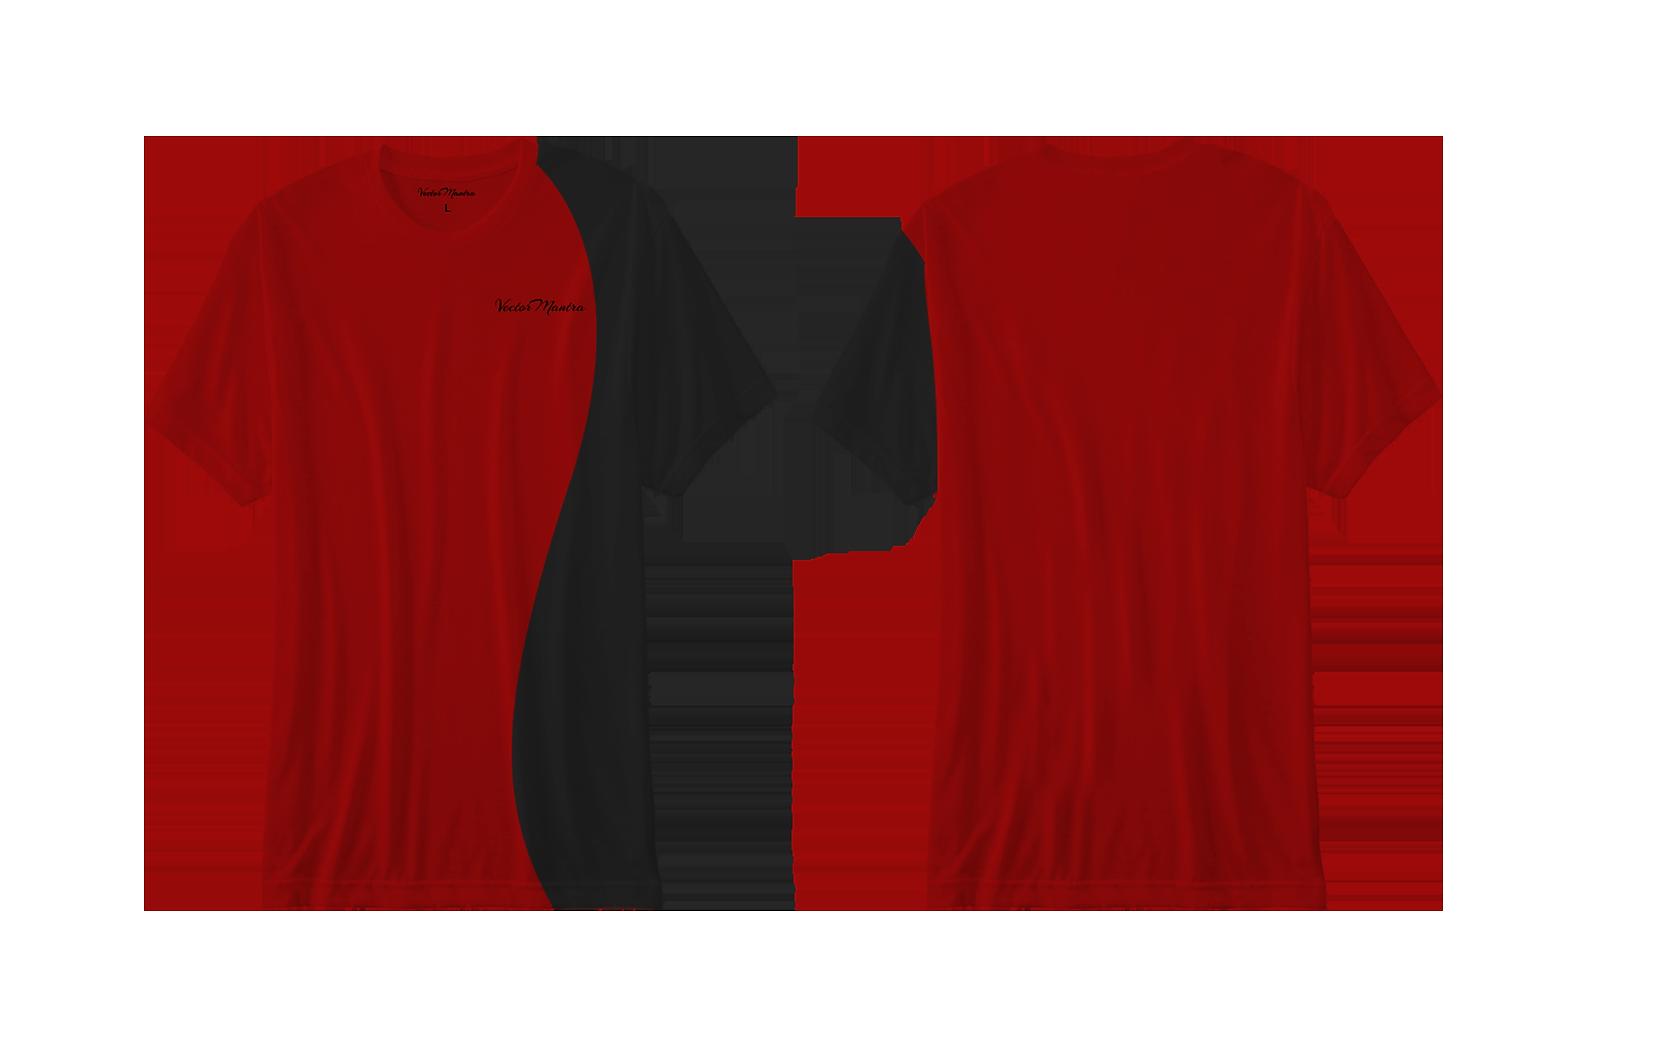 Design t shirt jerseys online - Sublimation Print T Shirts Customized Round Neck Jersey Jersey Design Online Design Jersey